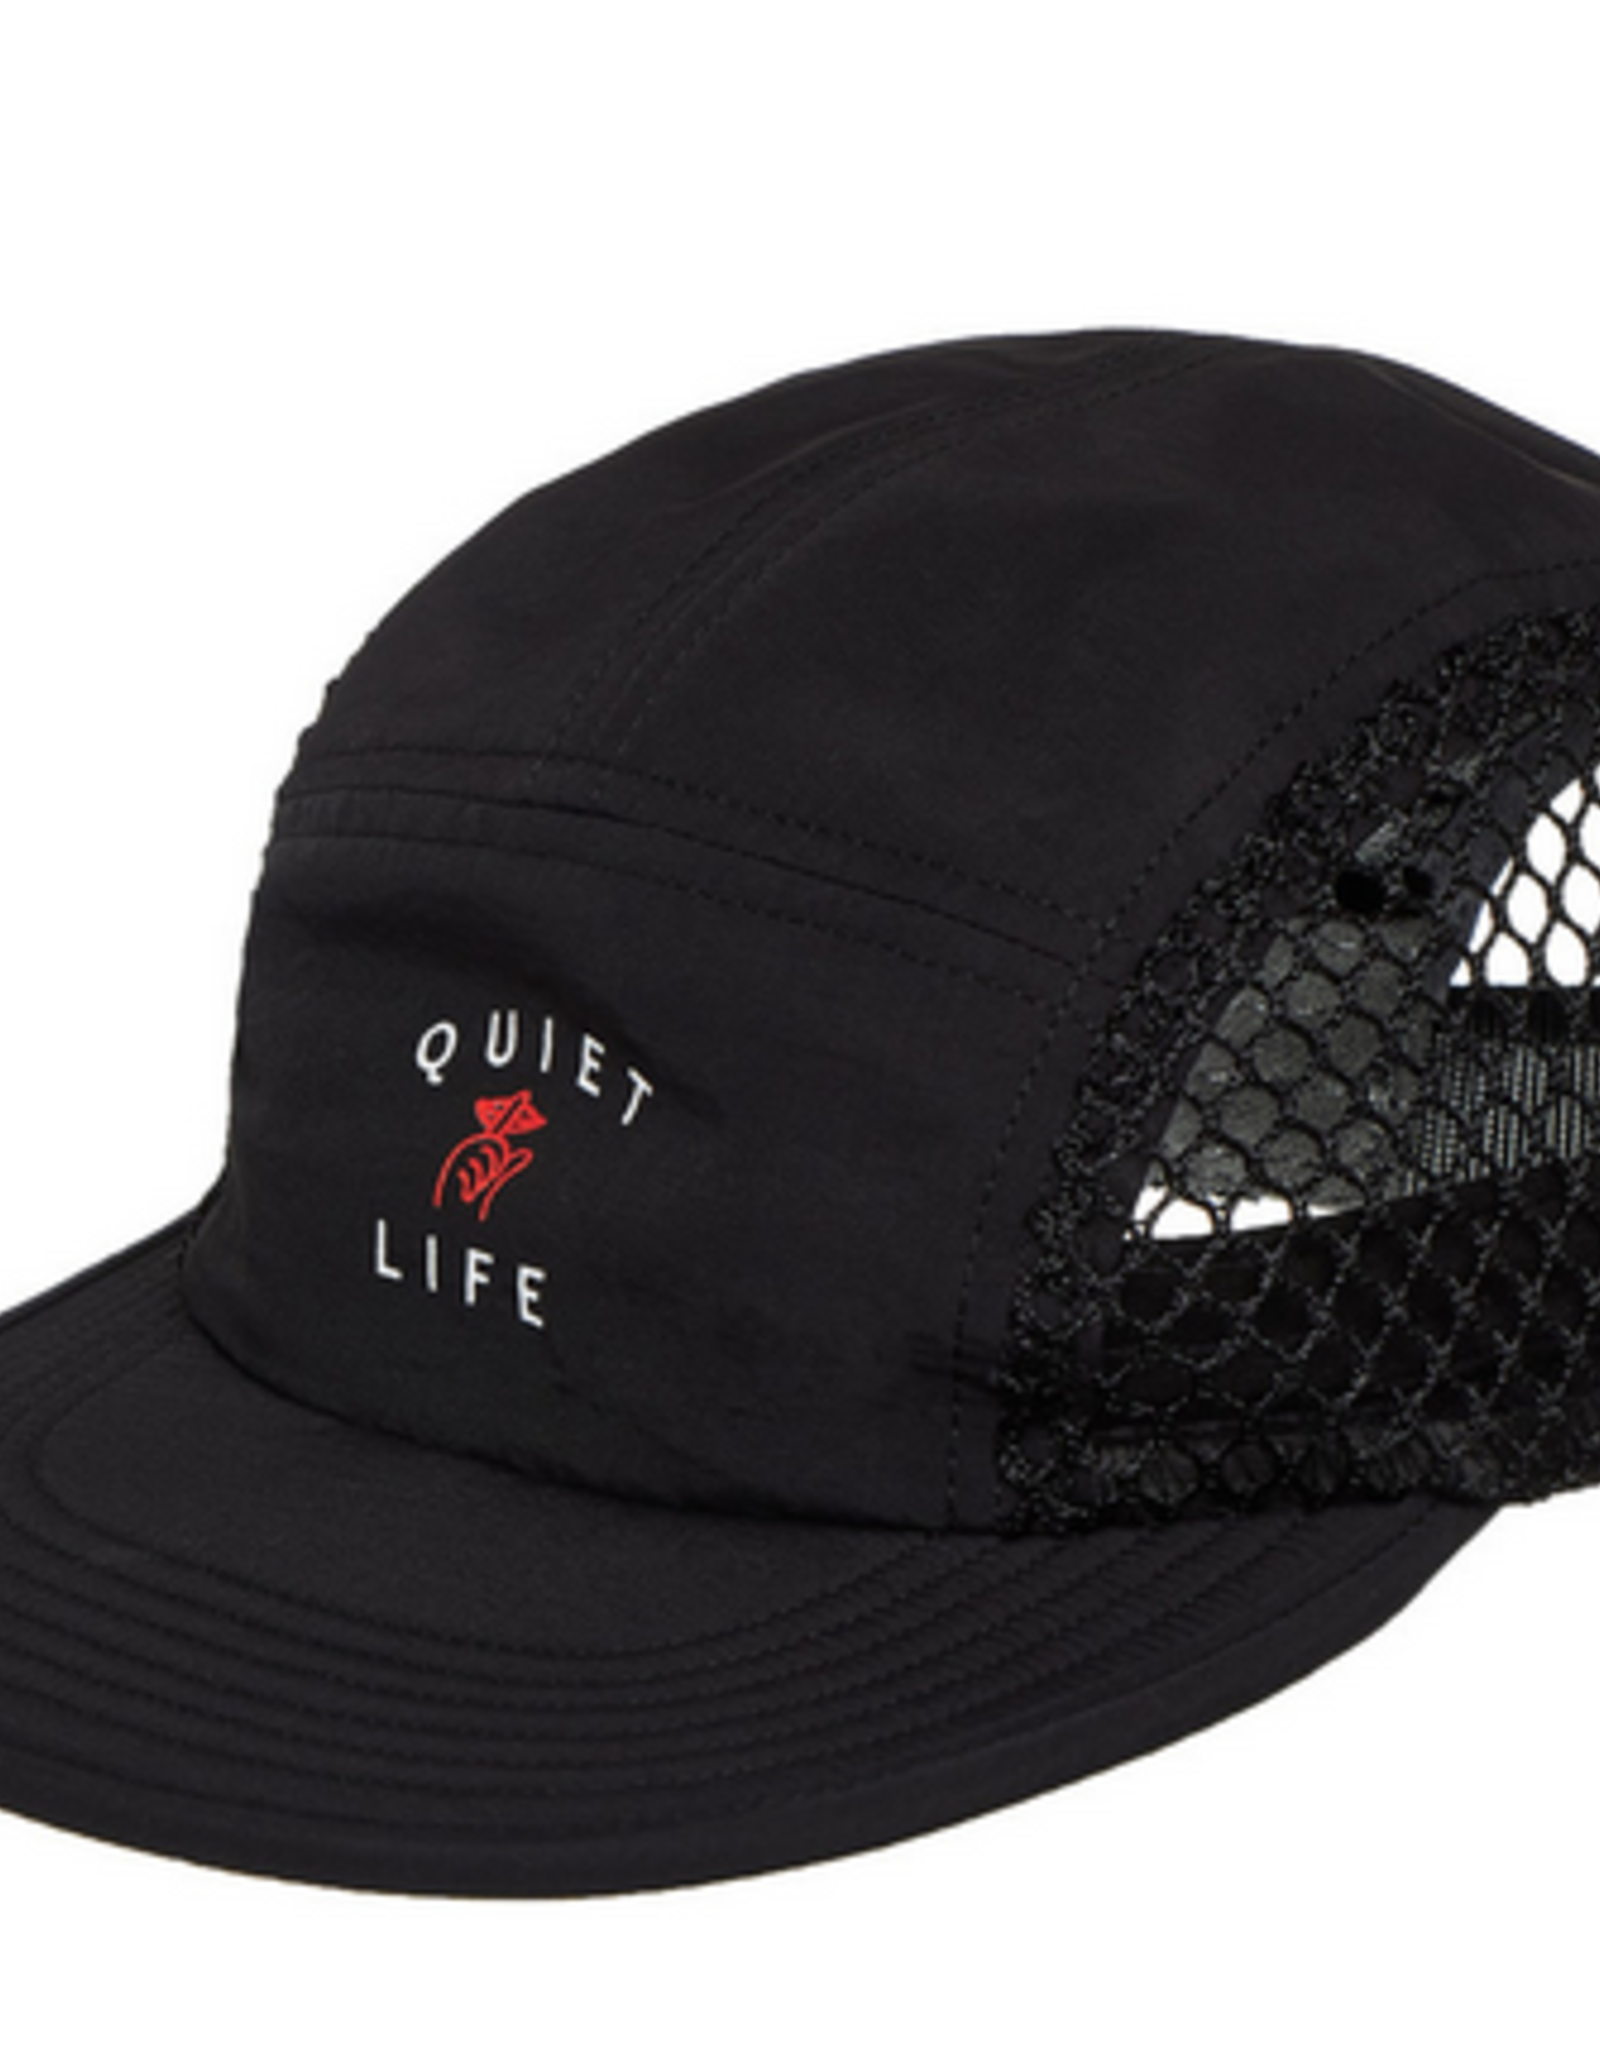 THE QUIET LIFE THE QUIET LIFE JUMBO 5 PANEL MESH CAP HAT BLACK